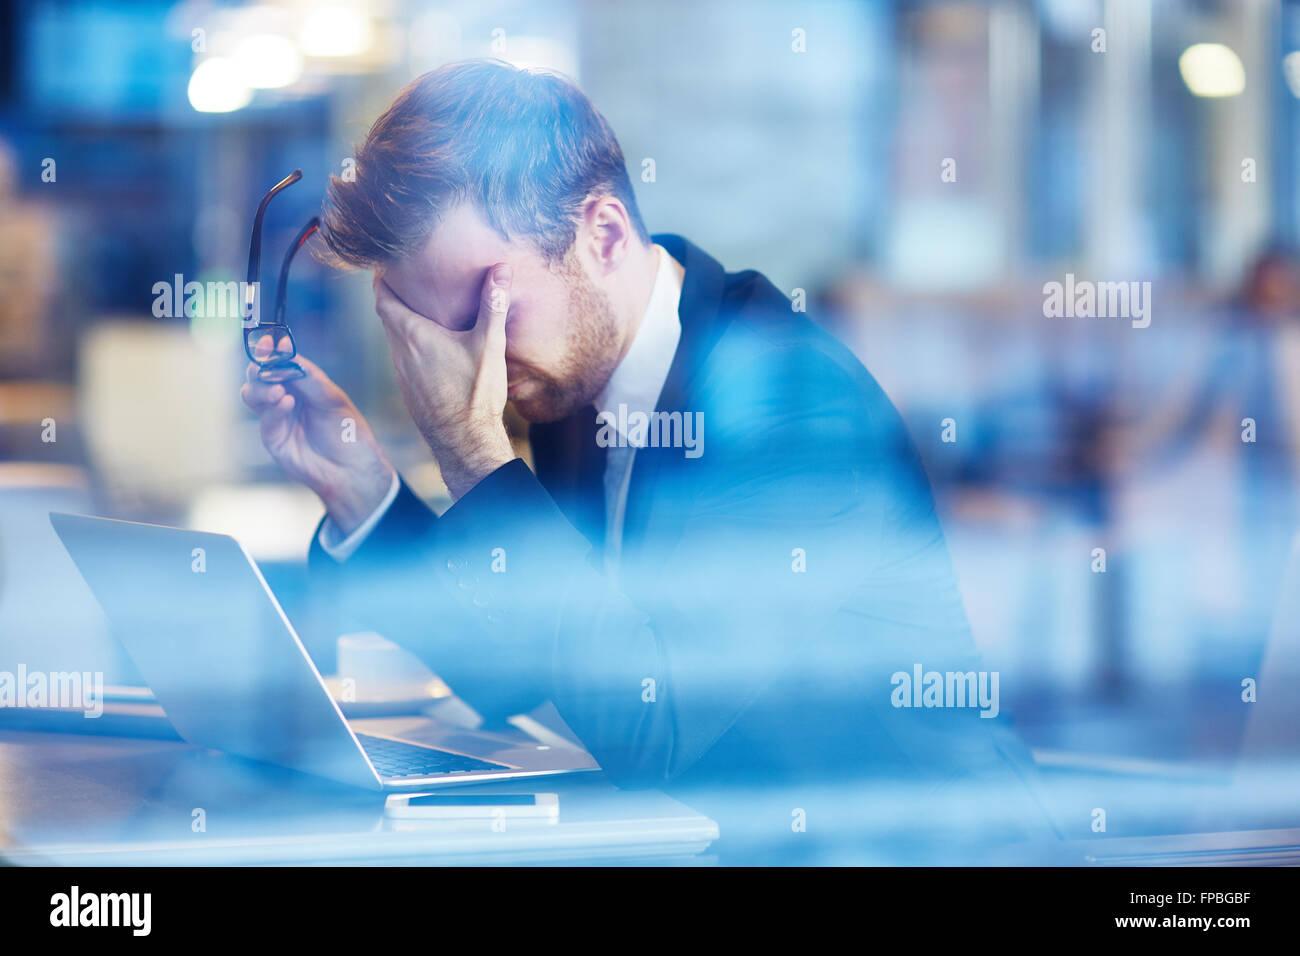 Depressed businessman sitting with laptop - Stock Image